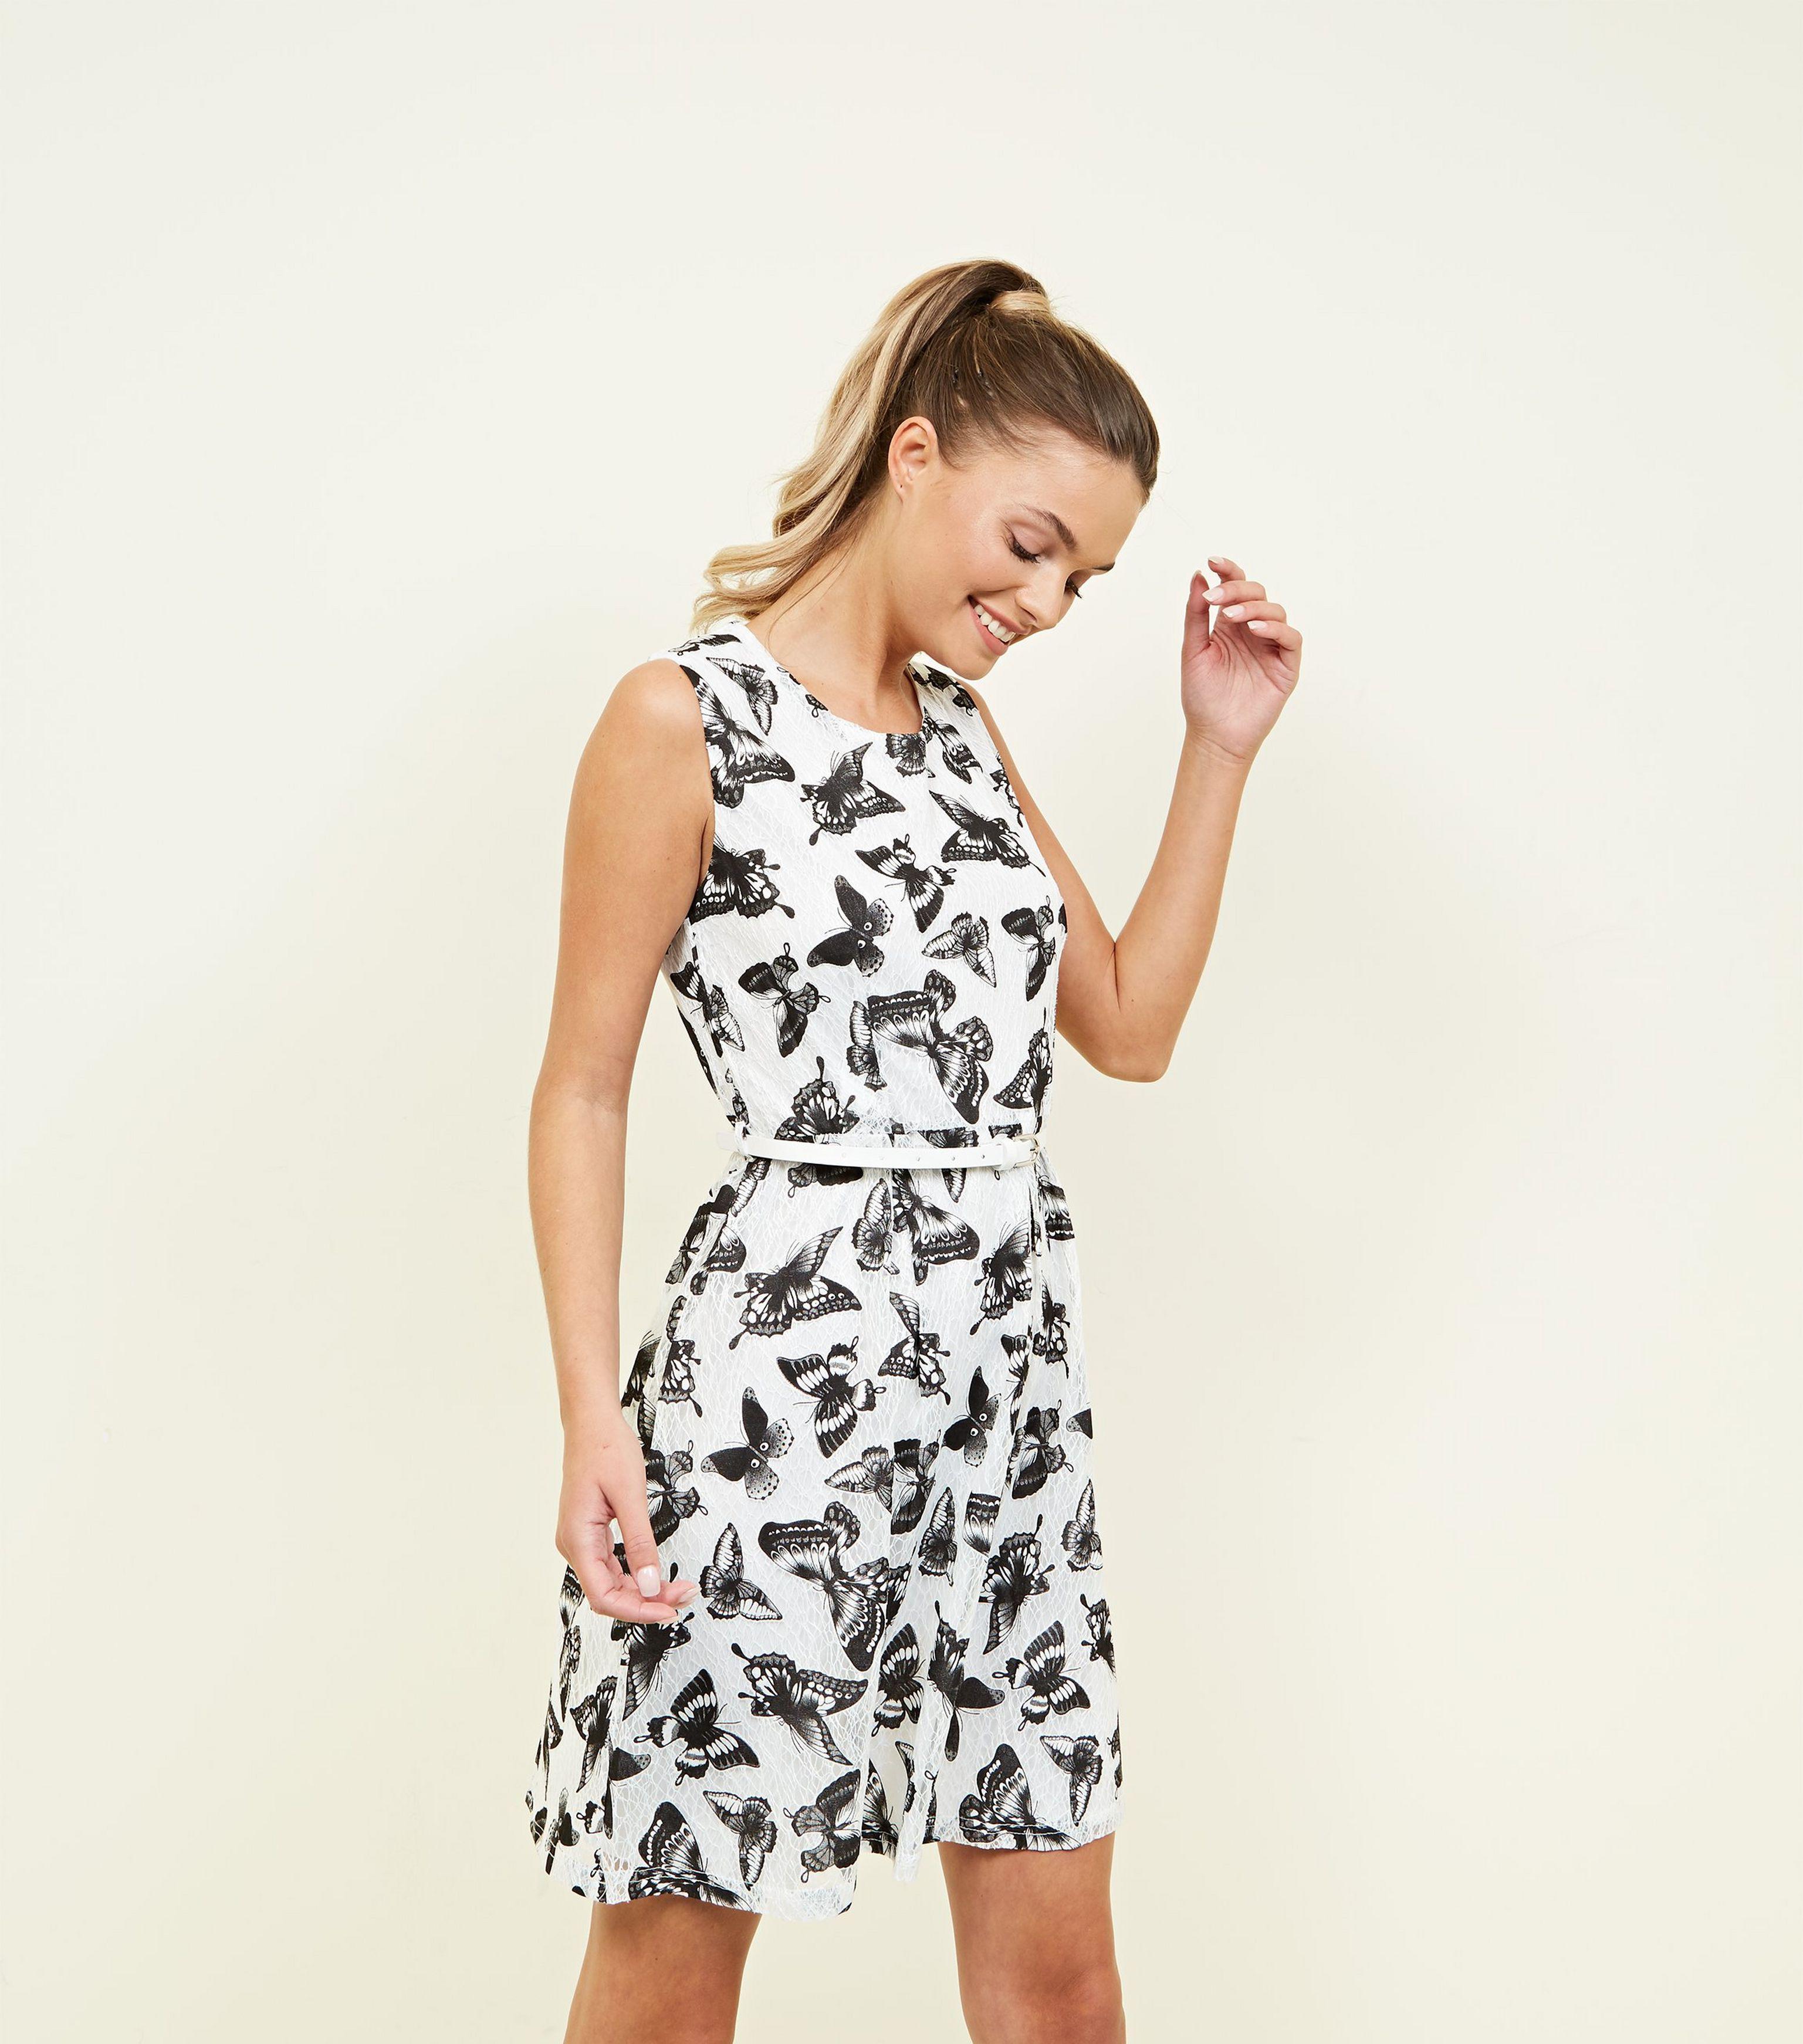 0fef3b1cf72 Mela White Butterfly Lace Belted Skater Dress in White - Lyst